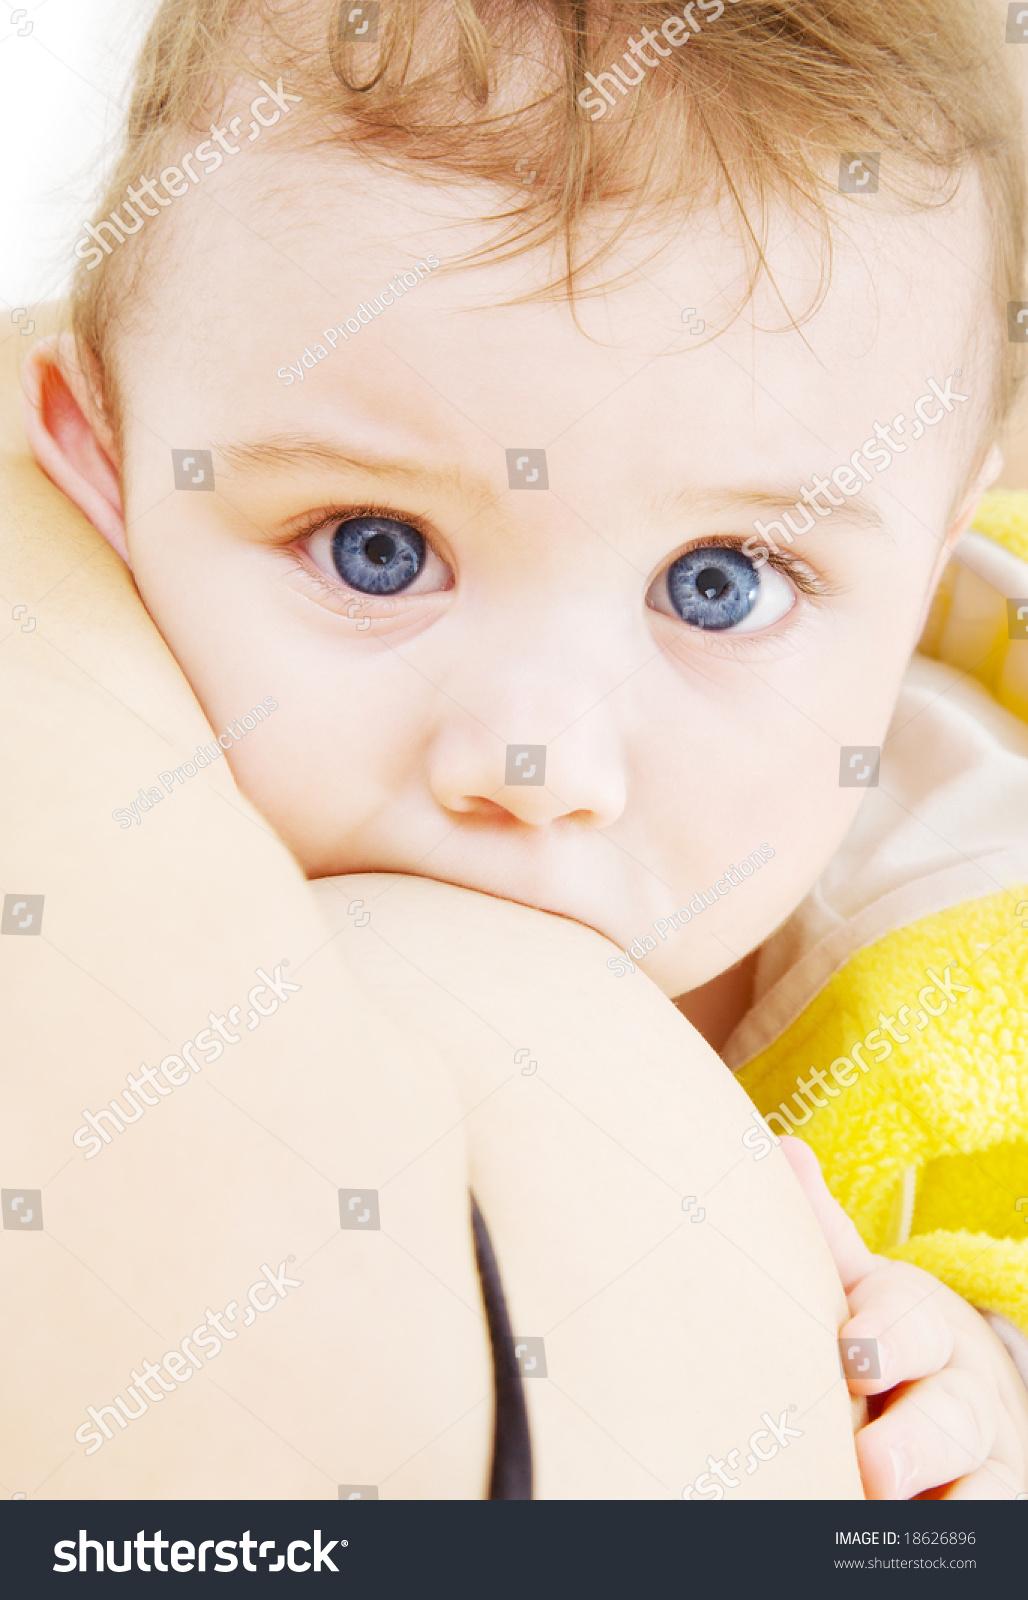 Mommy suck baby boy